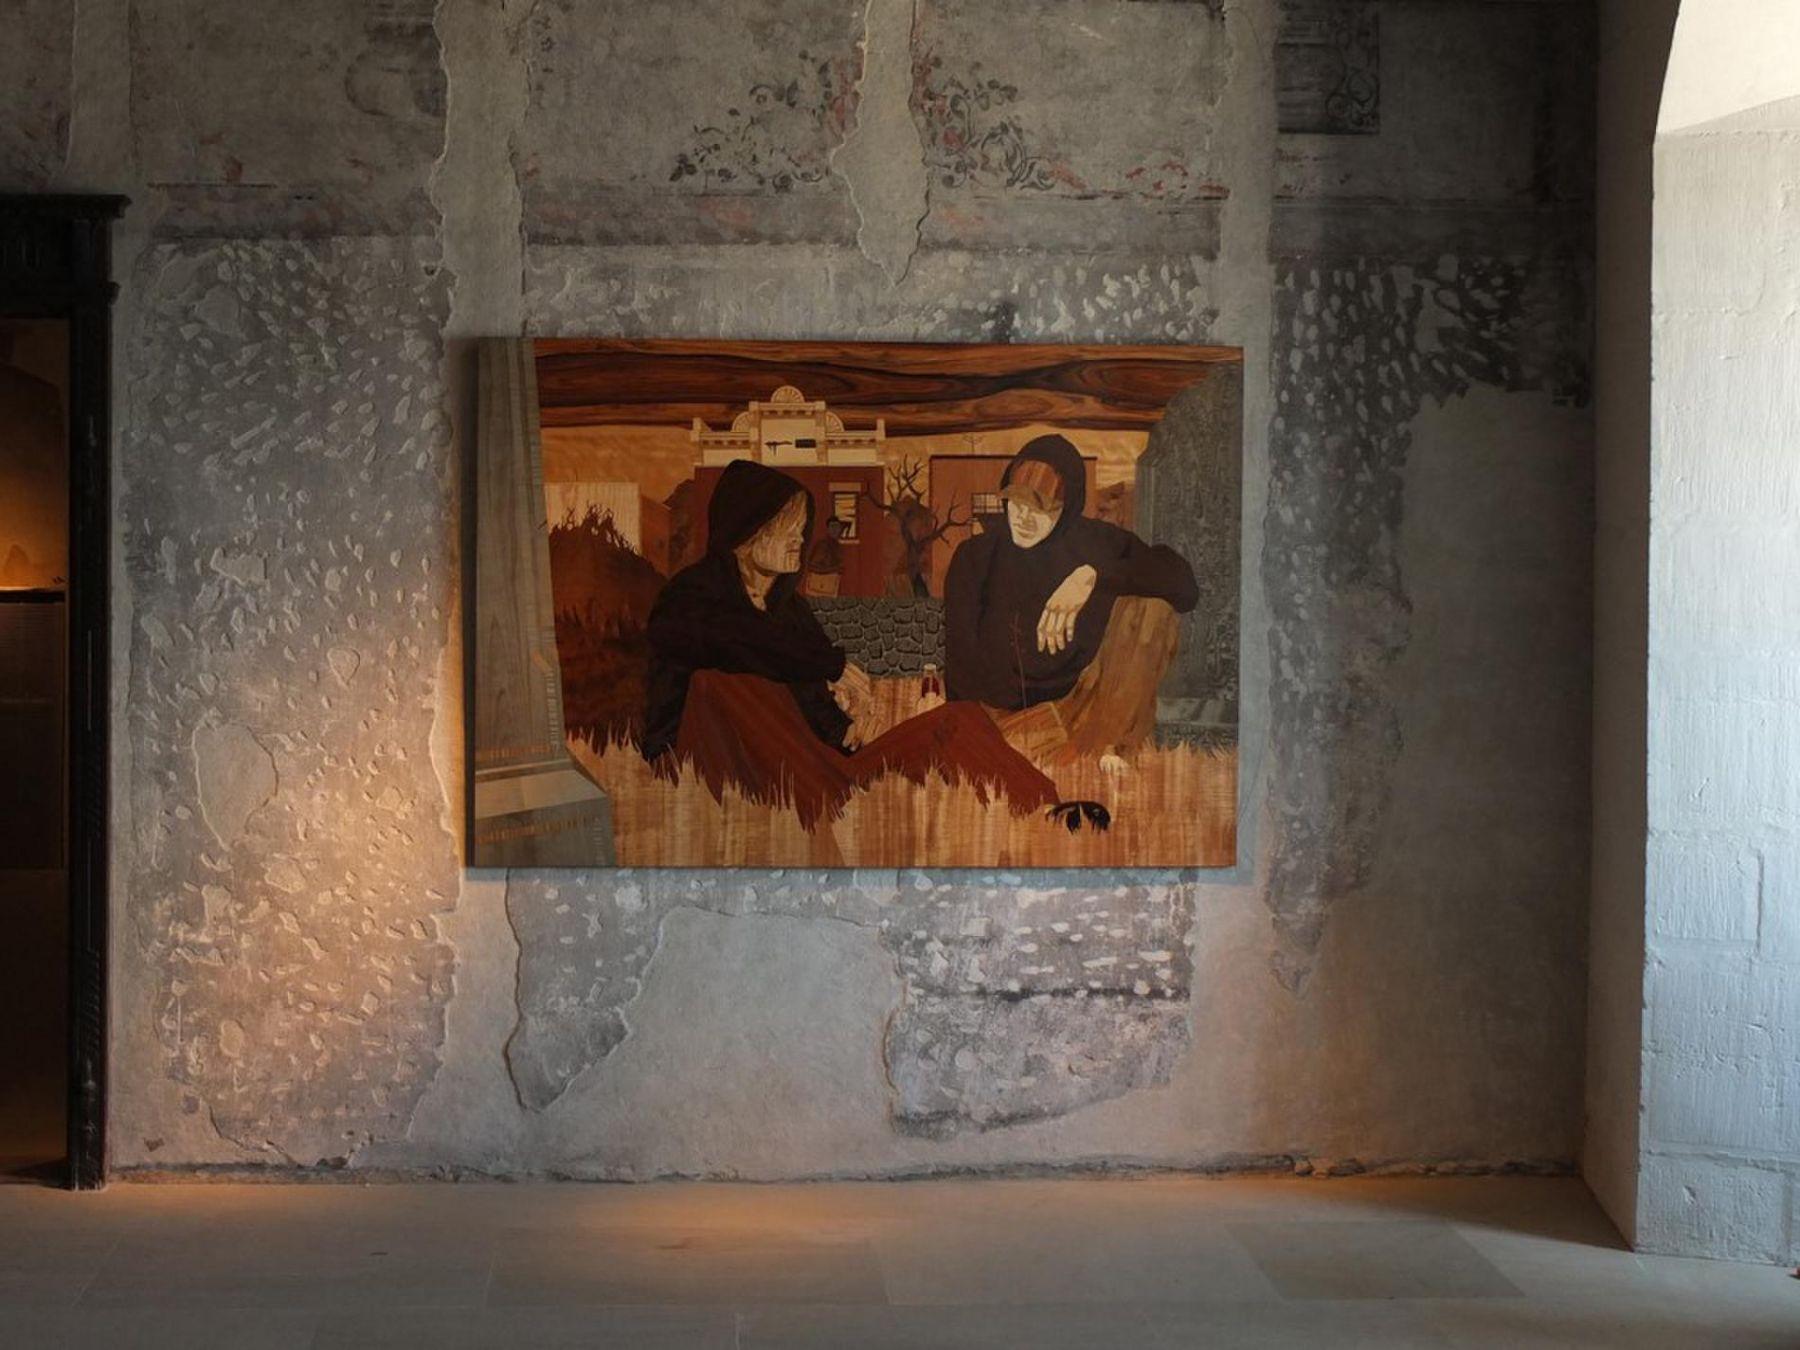 , Exhibition view at Chateau de Nyon